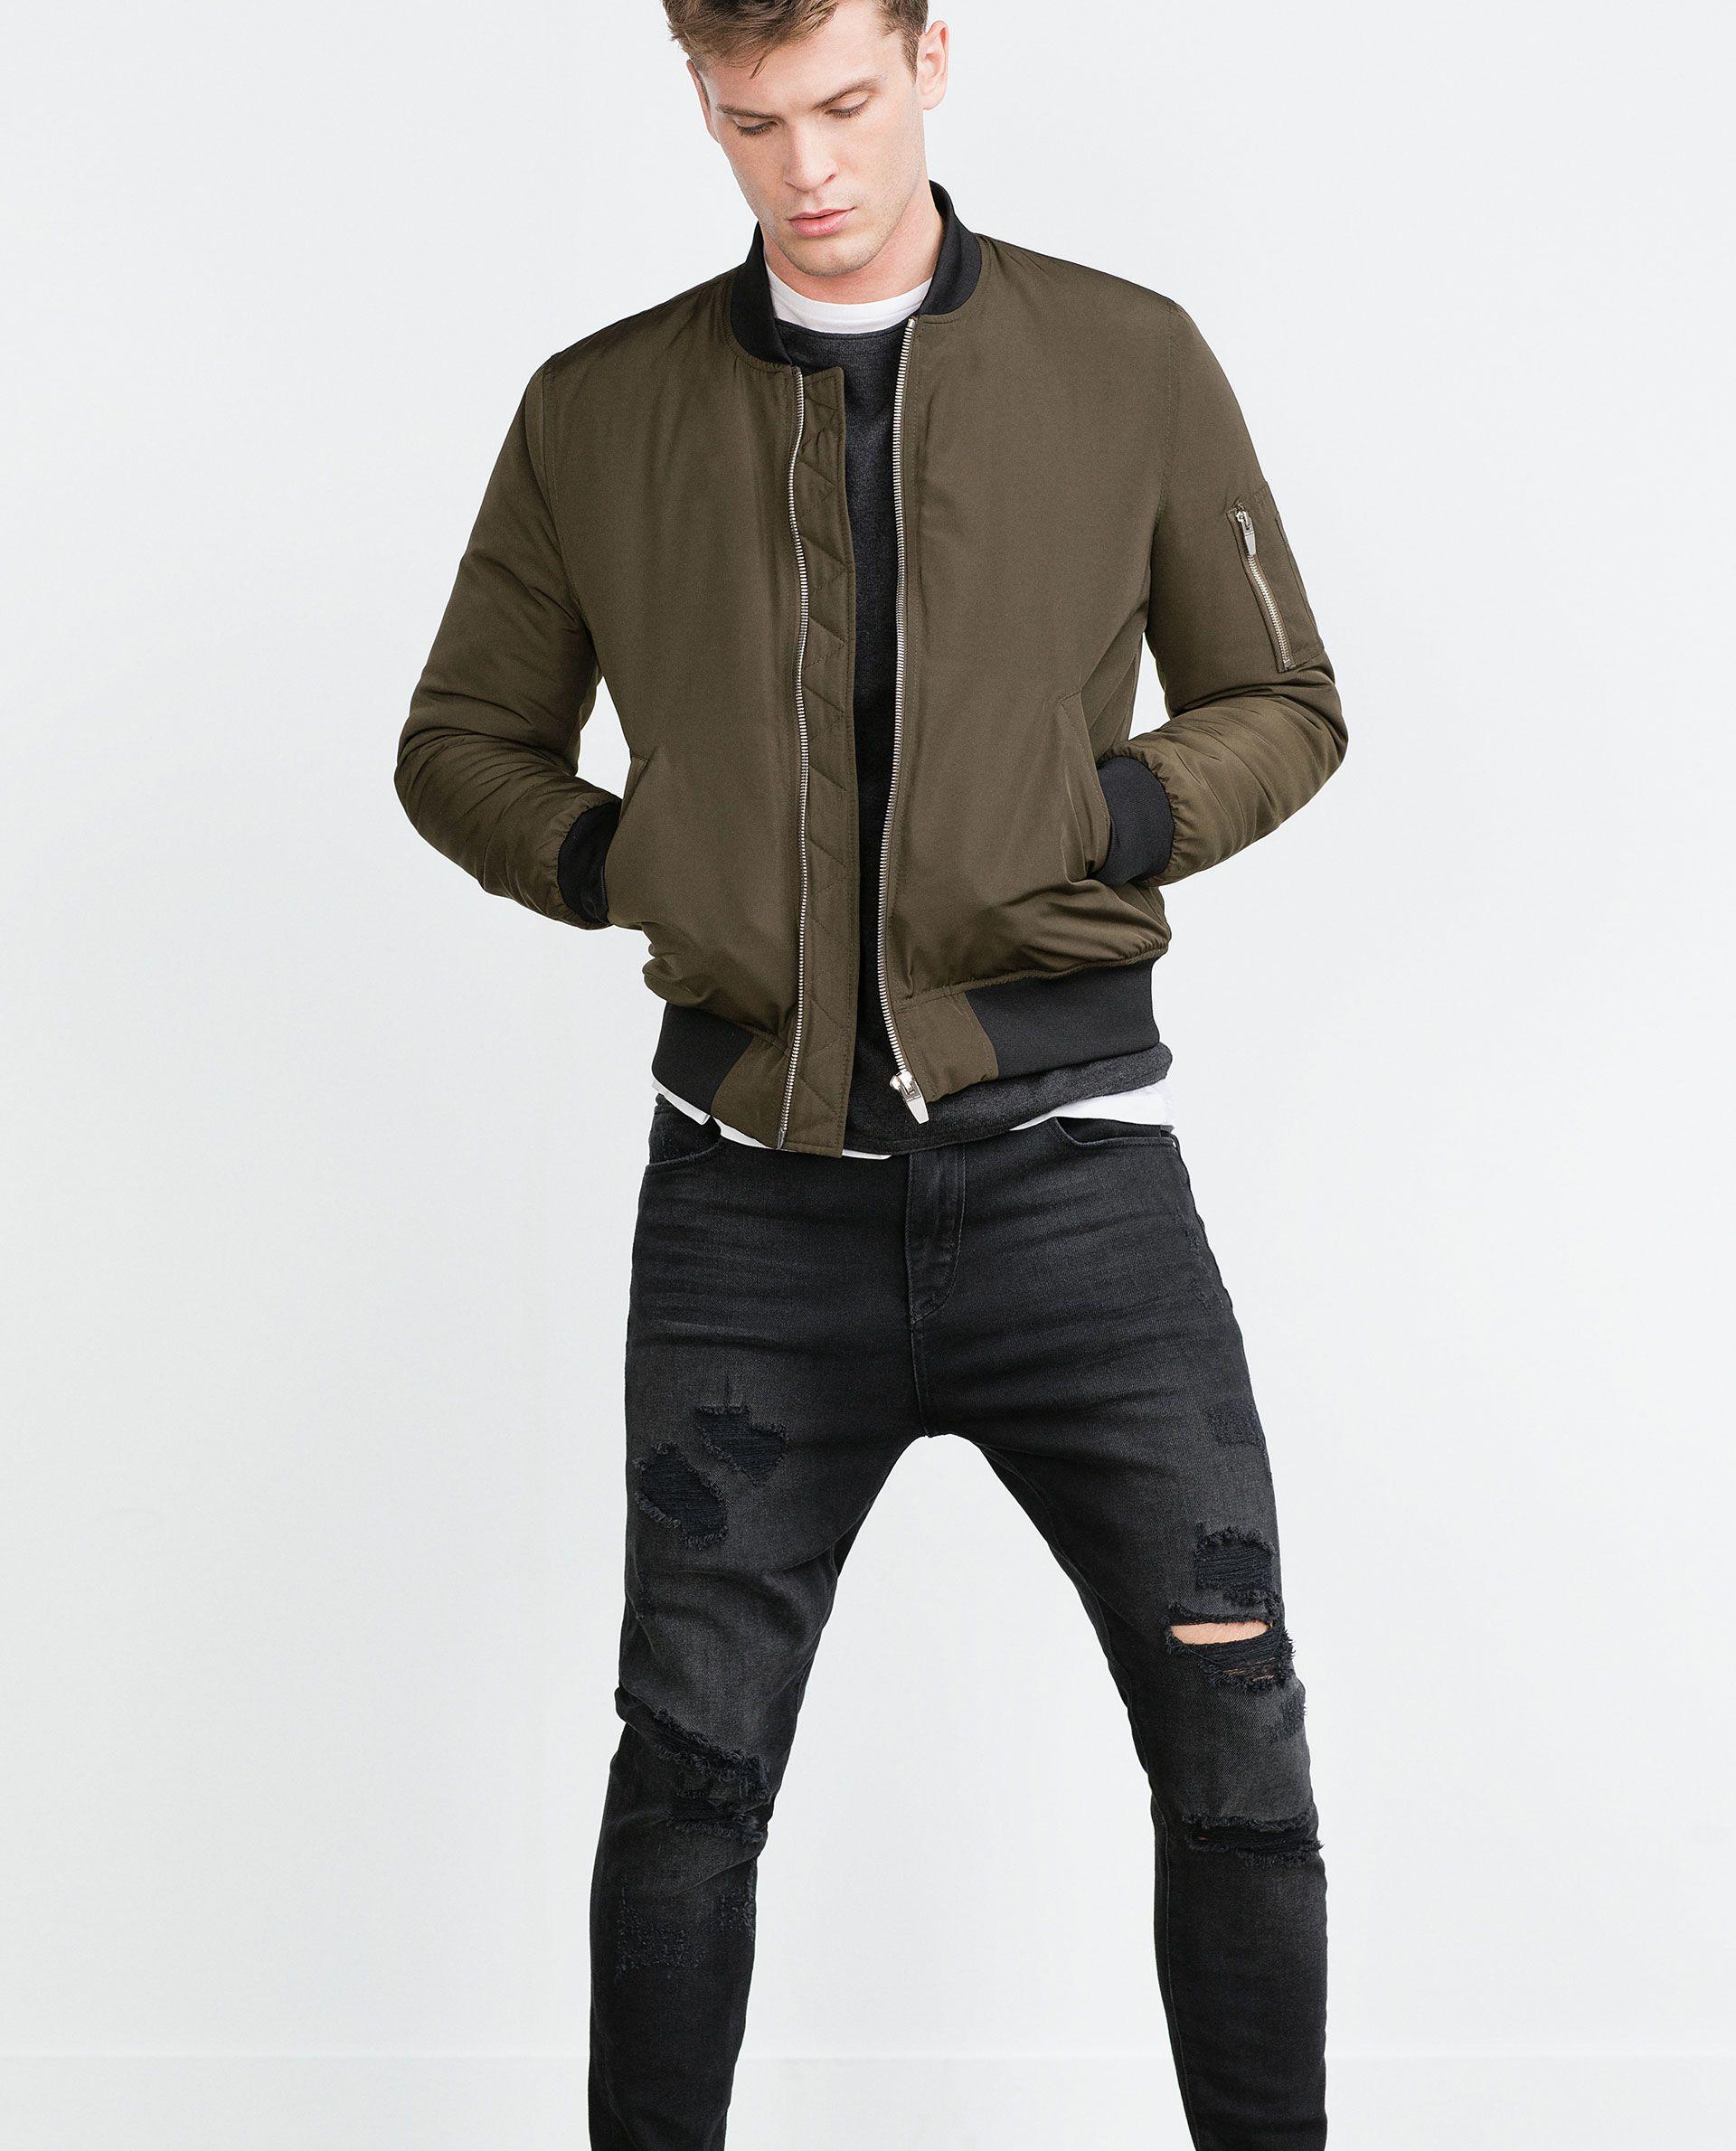 BOMBER JACKET from Zara Bomber jacket outfit, Bomber